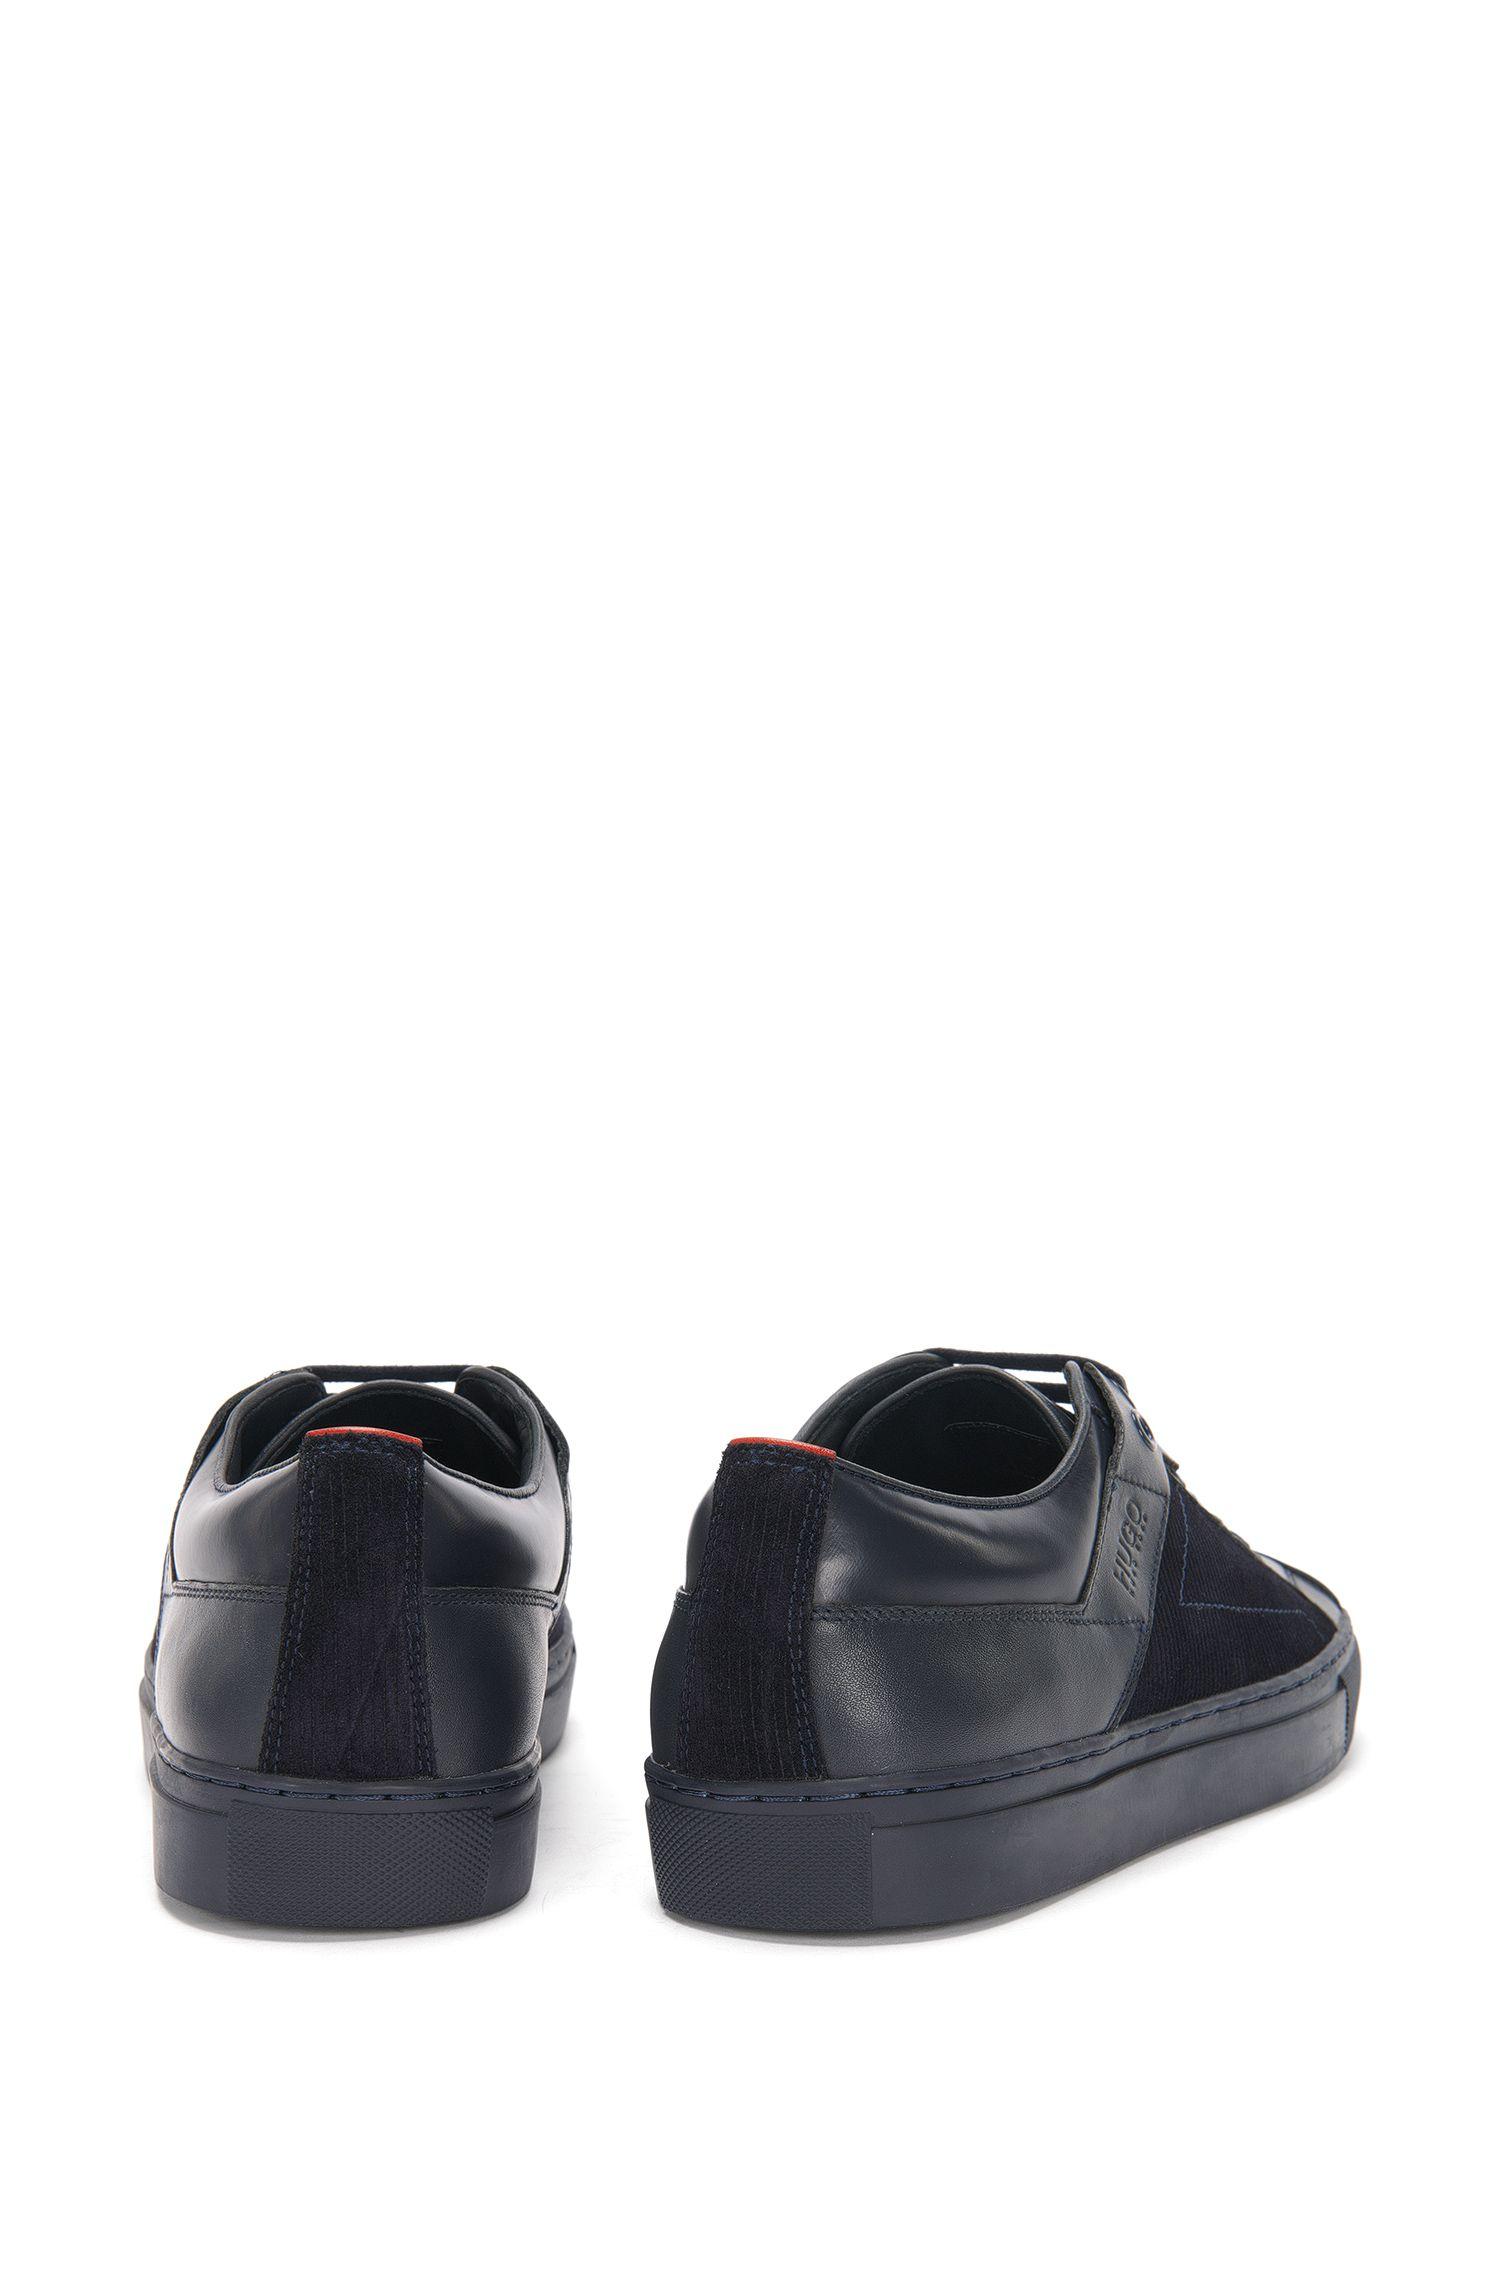 Sneakers aus Leder mit Samtdruck: 'Futurism_Tenn_mxpr'